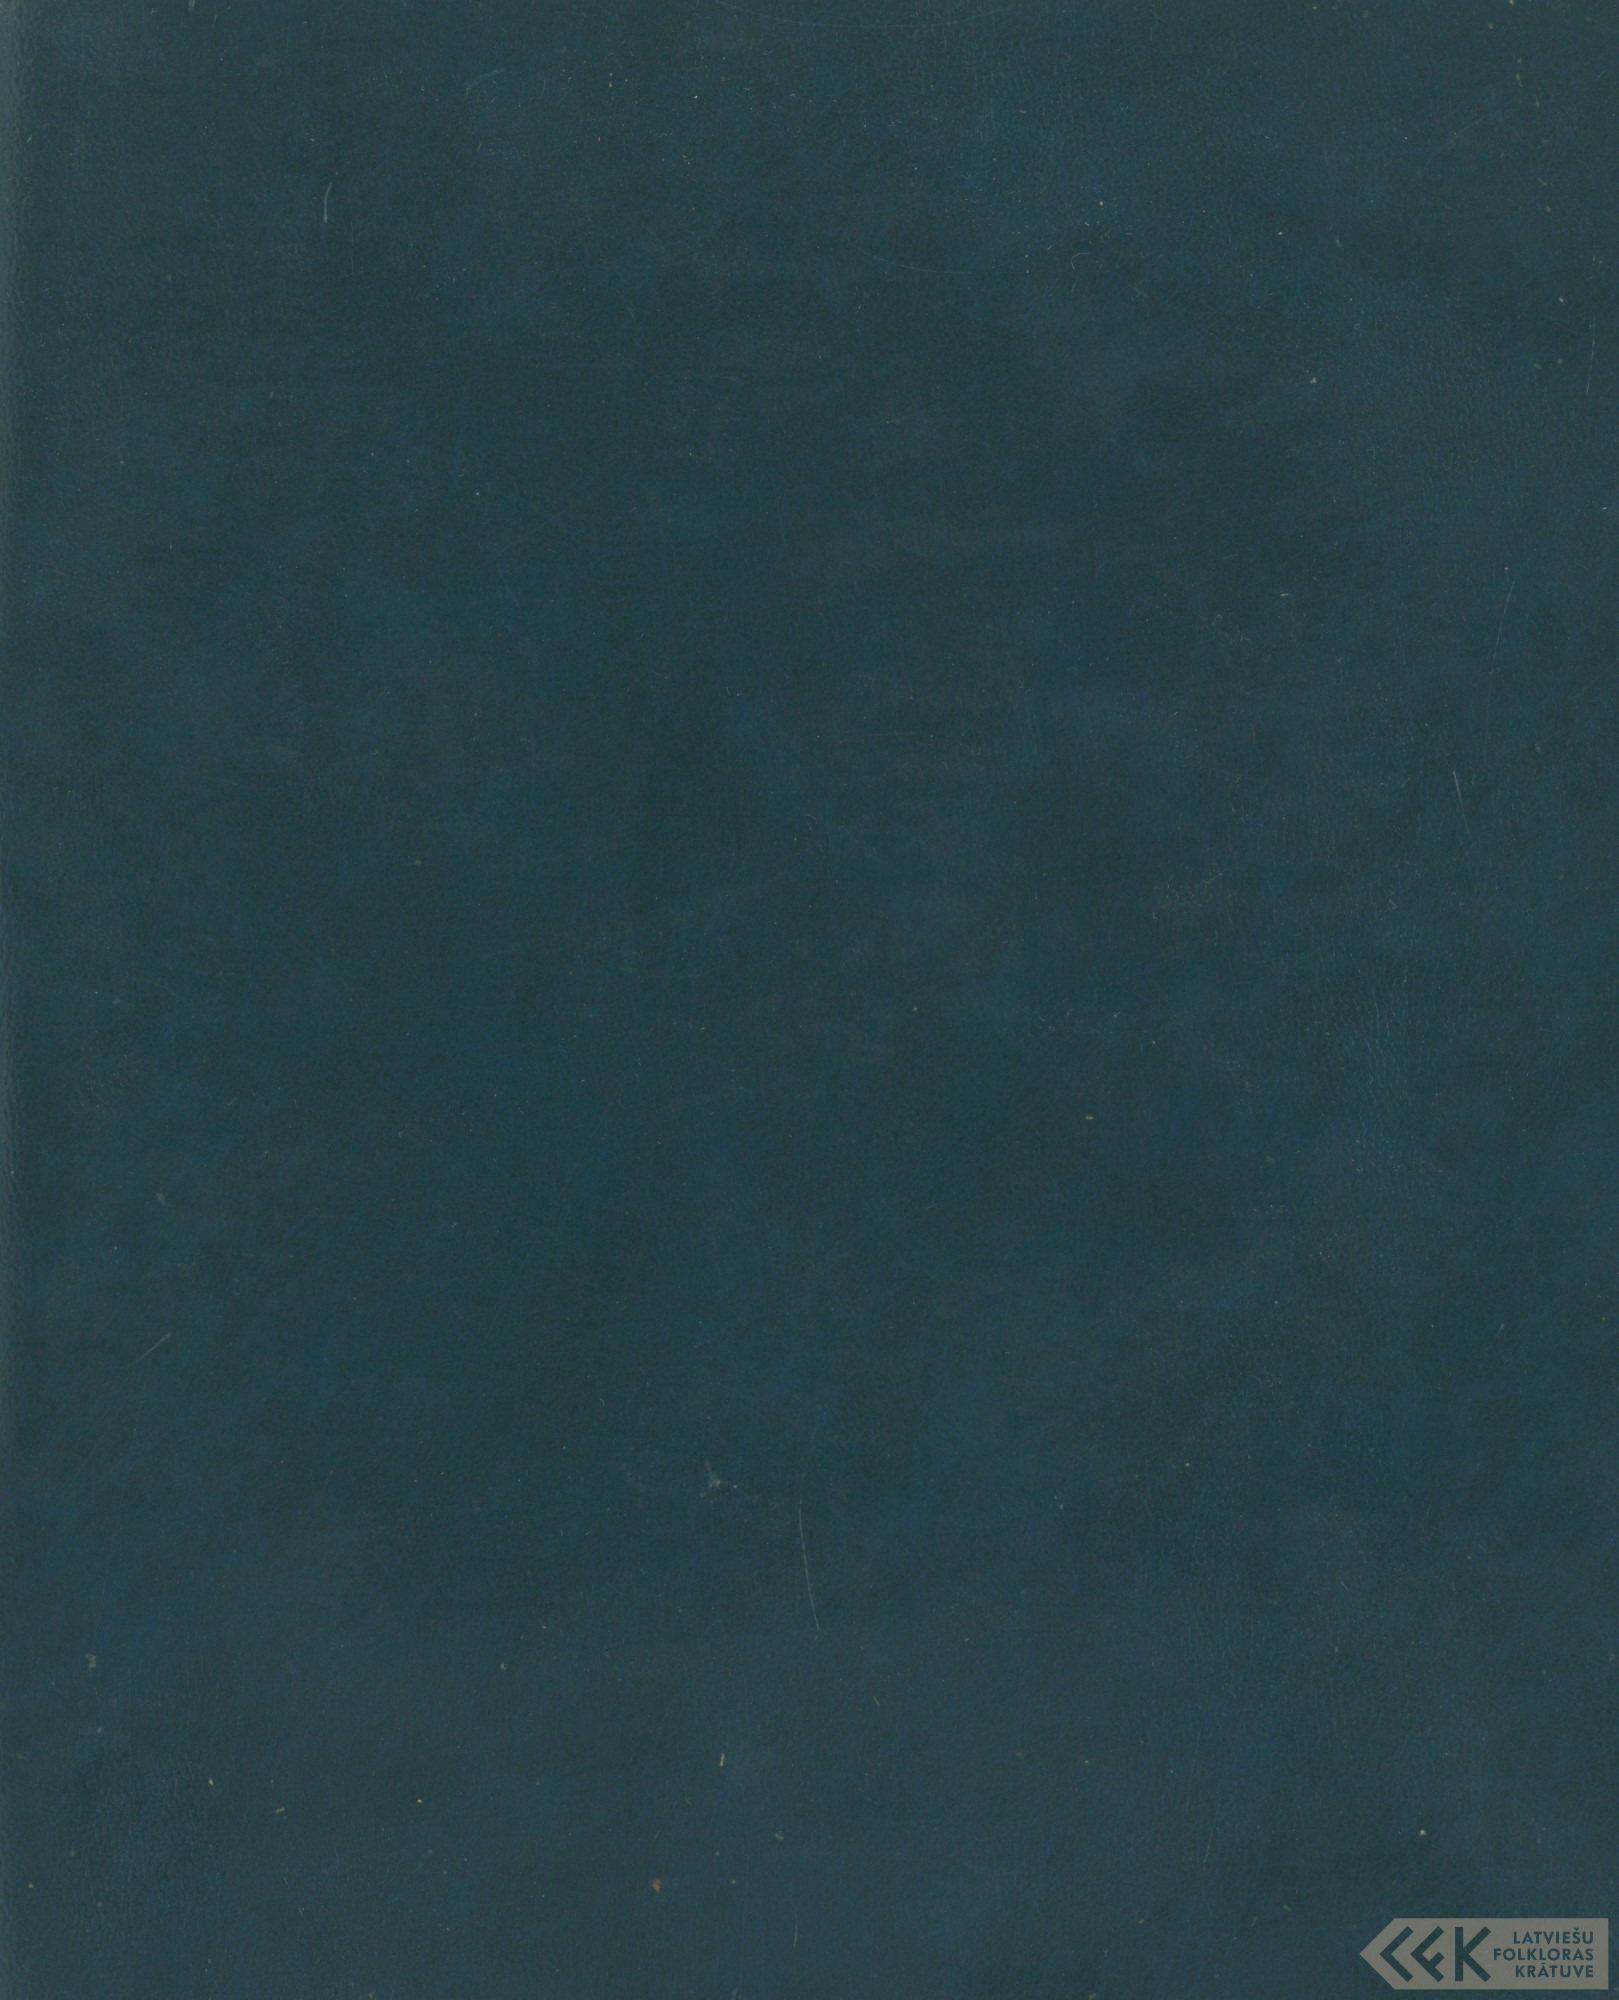 Ak161-Ligitas-Vucenas-dienasgramatas-41-0001